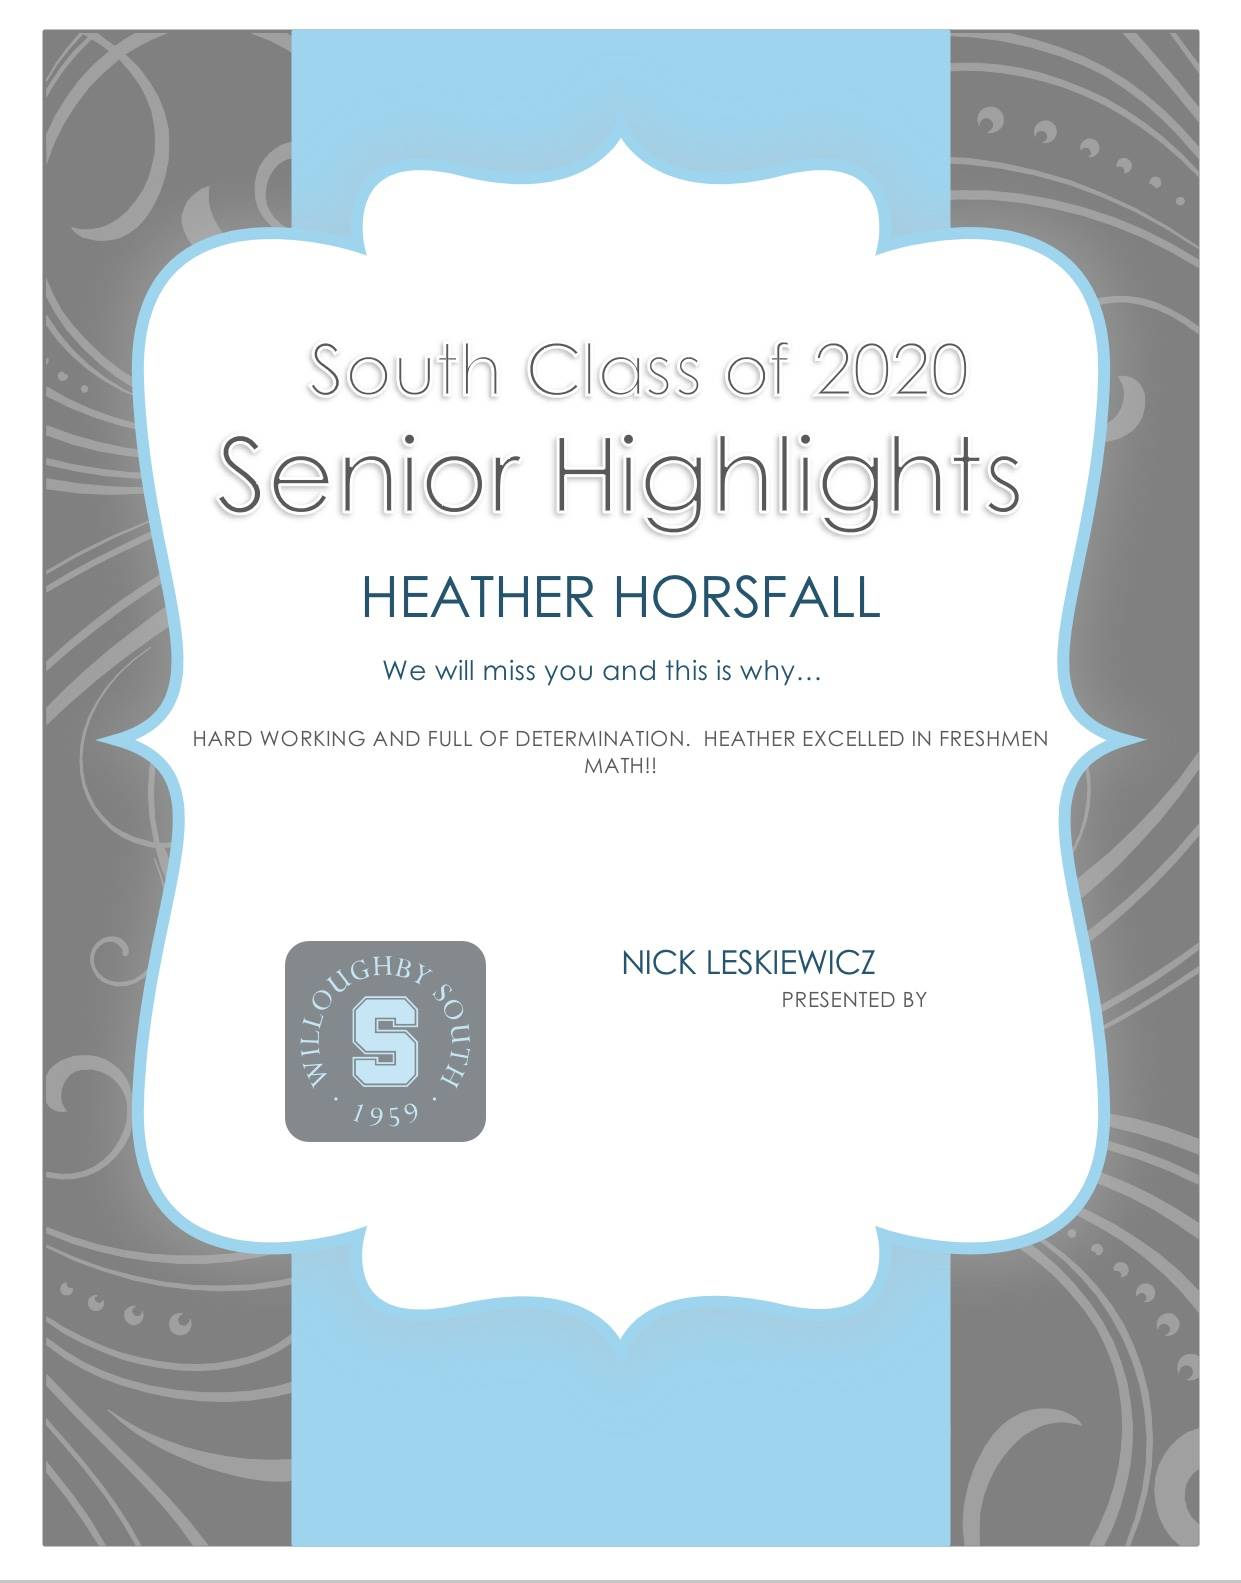 Heather Horsfall